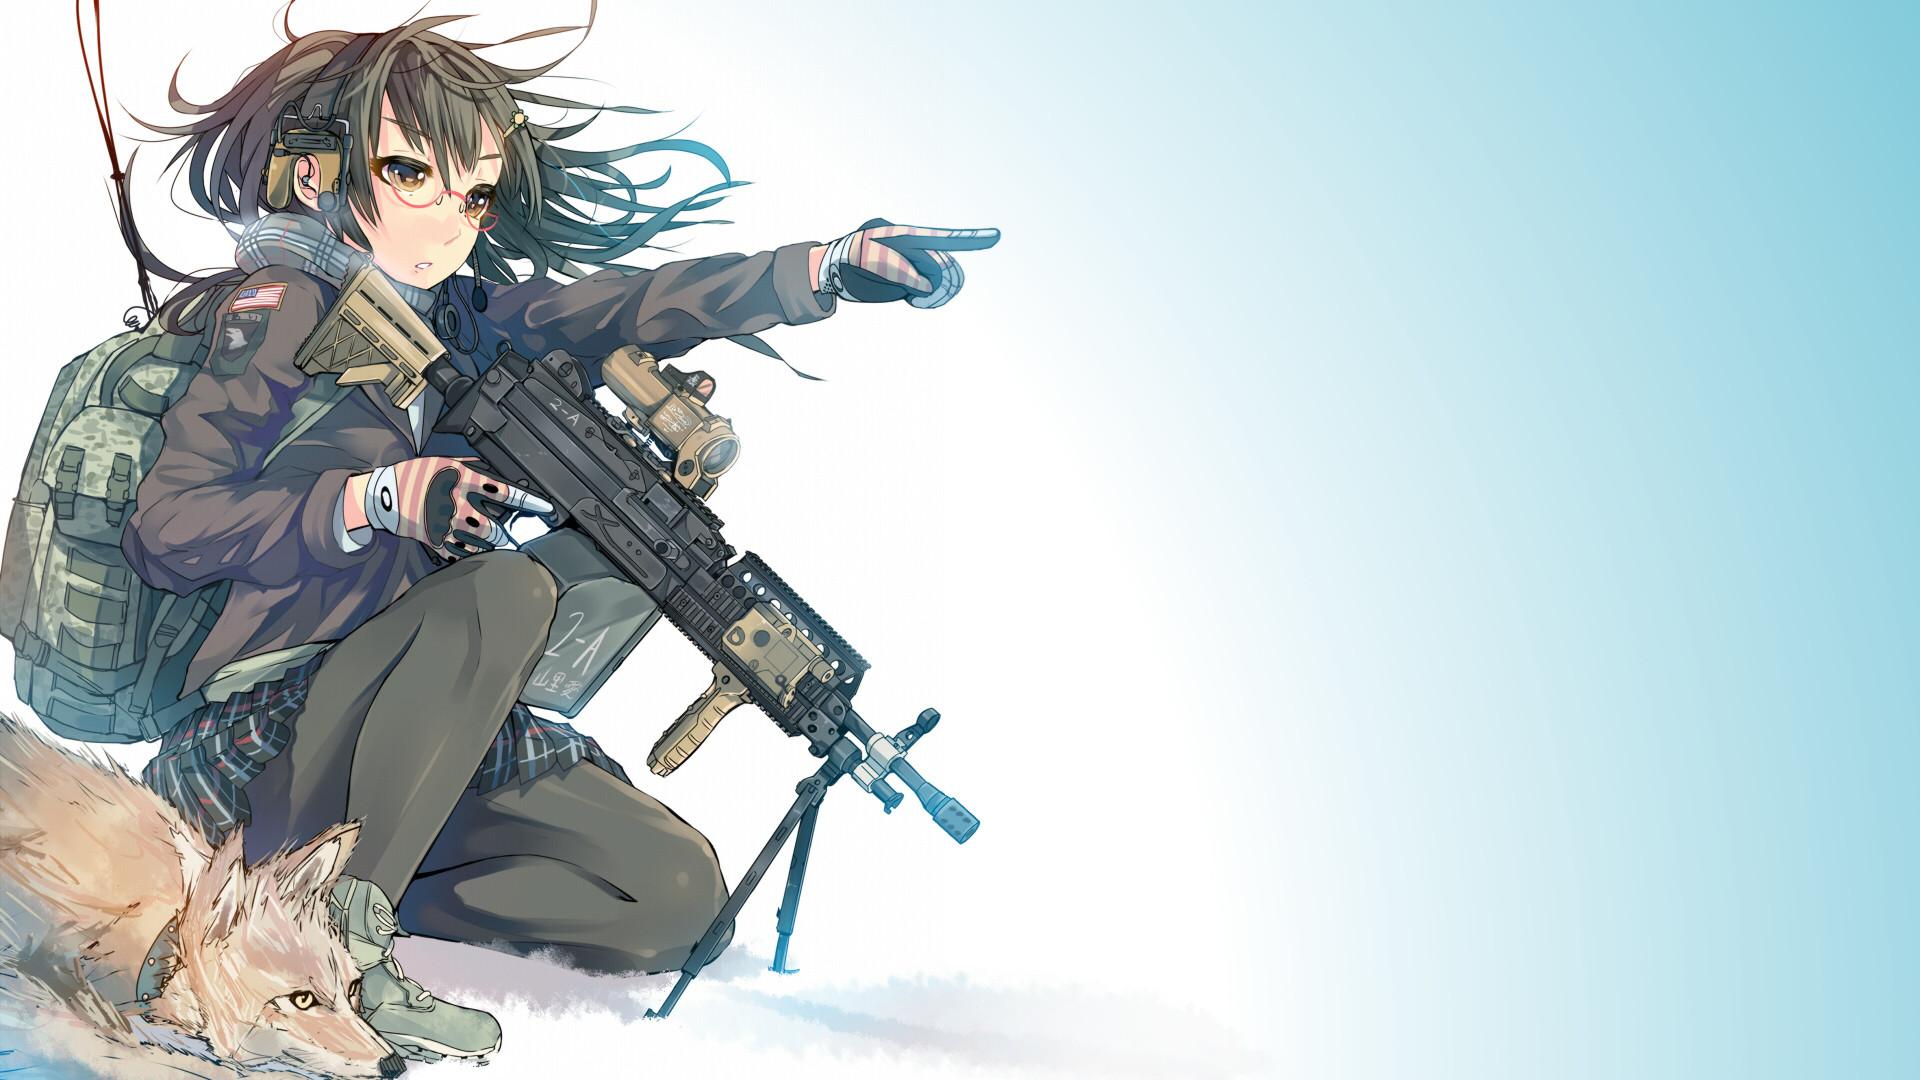 Anime Gril With Gun HD Wallpaper | 1920x1080 | ID:56933